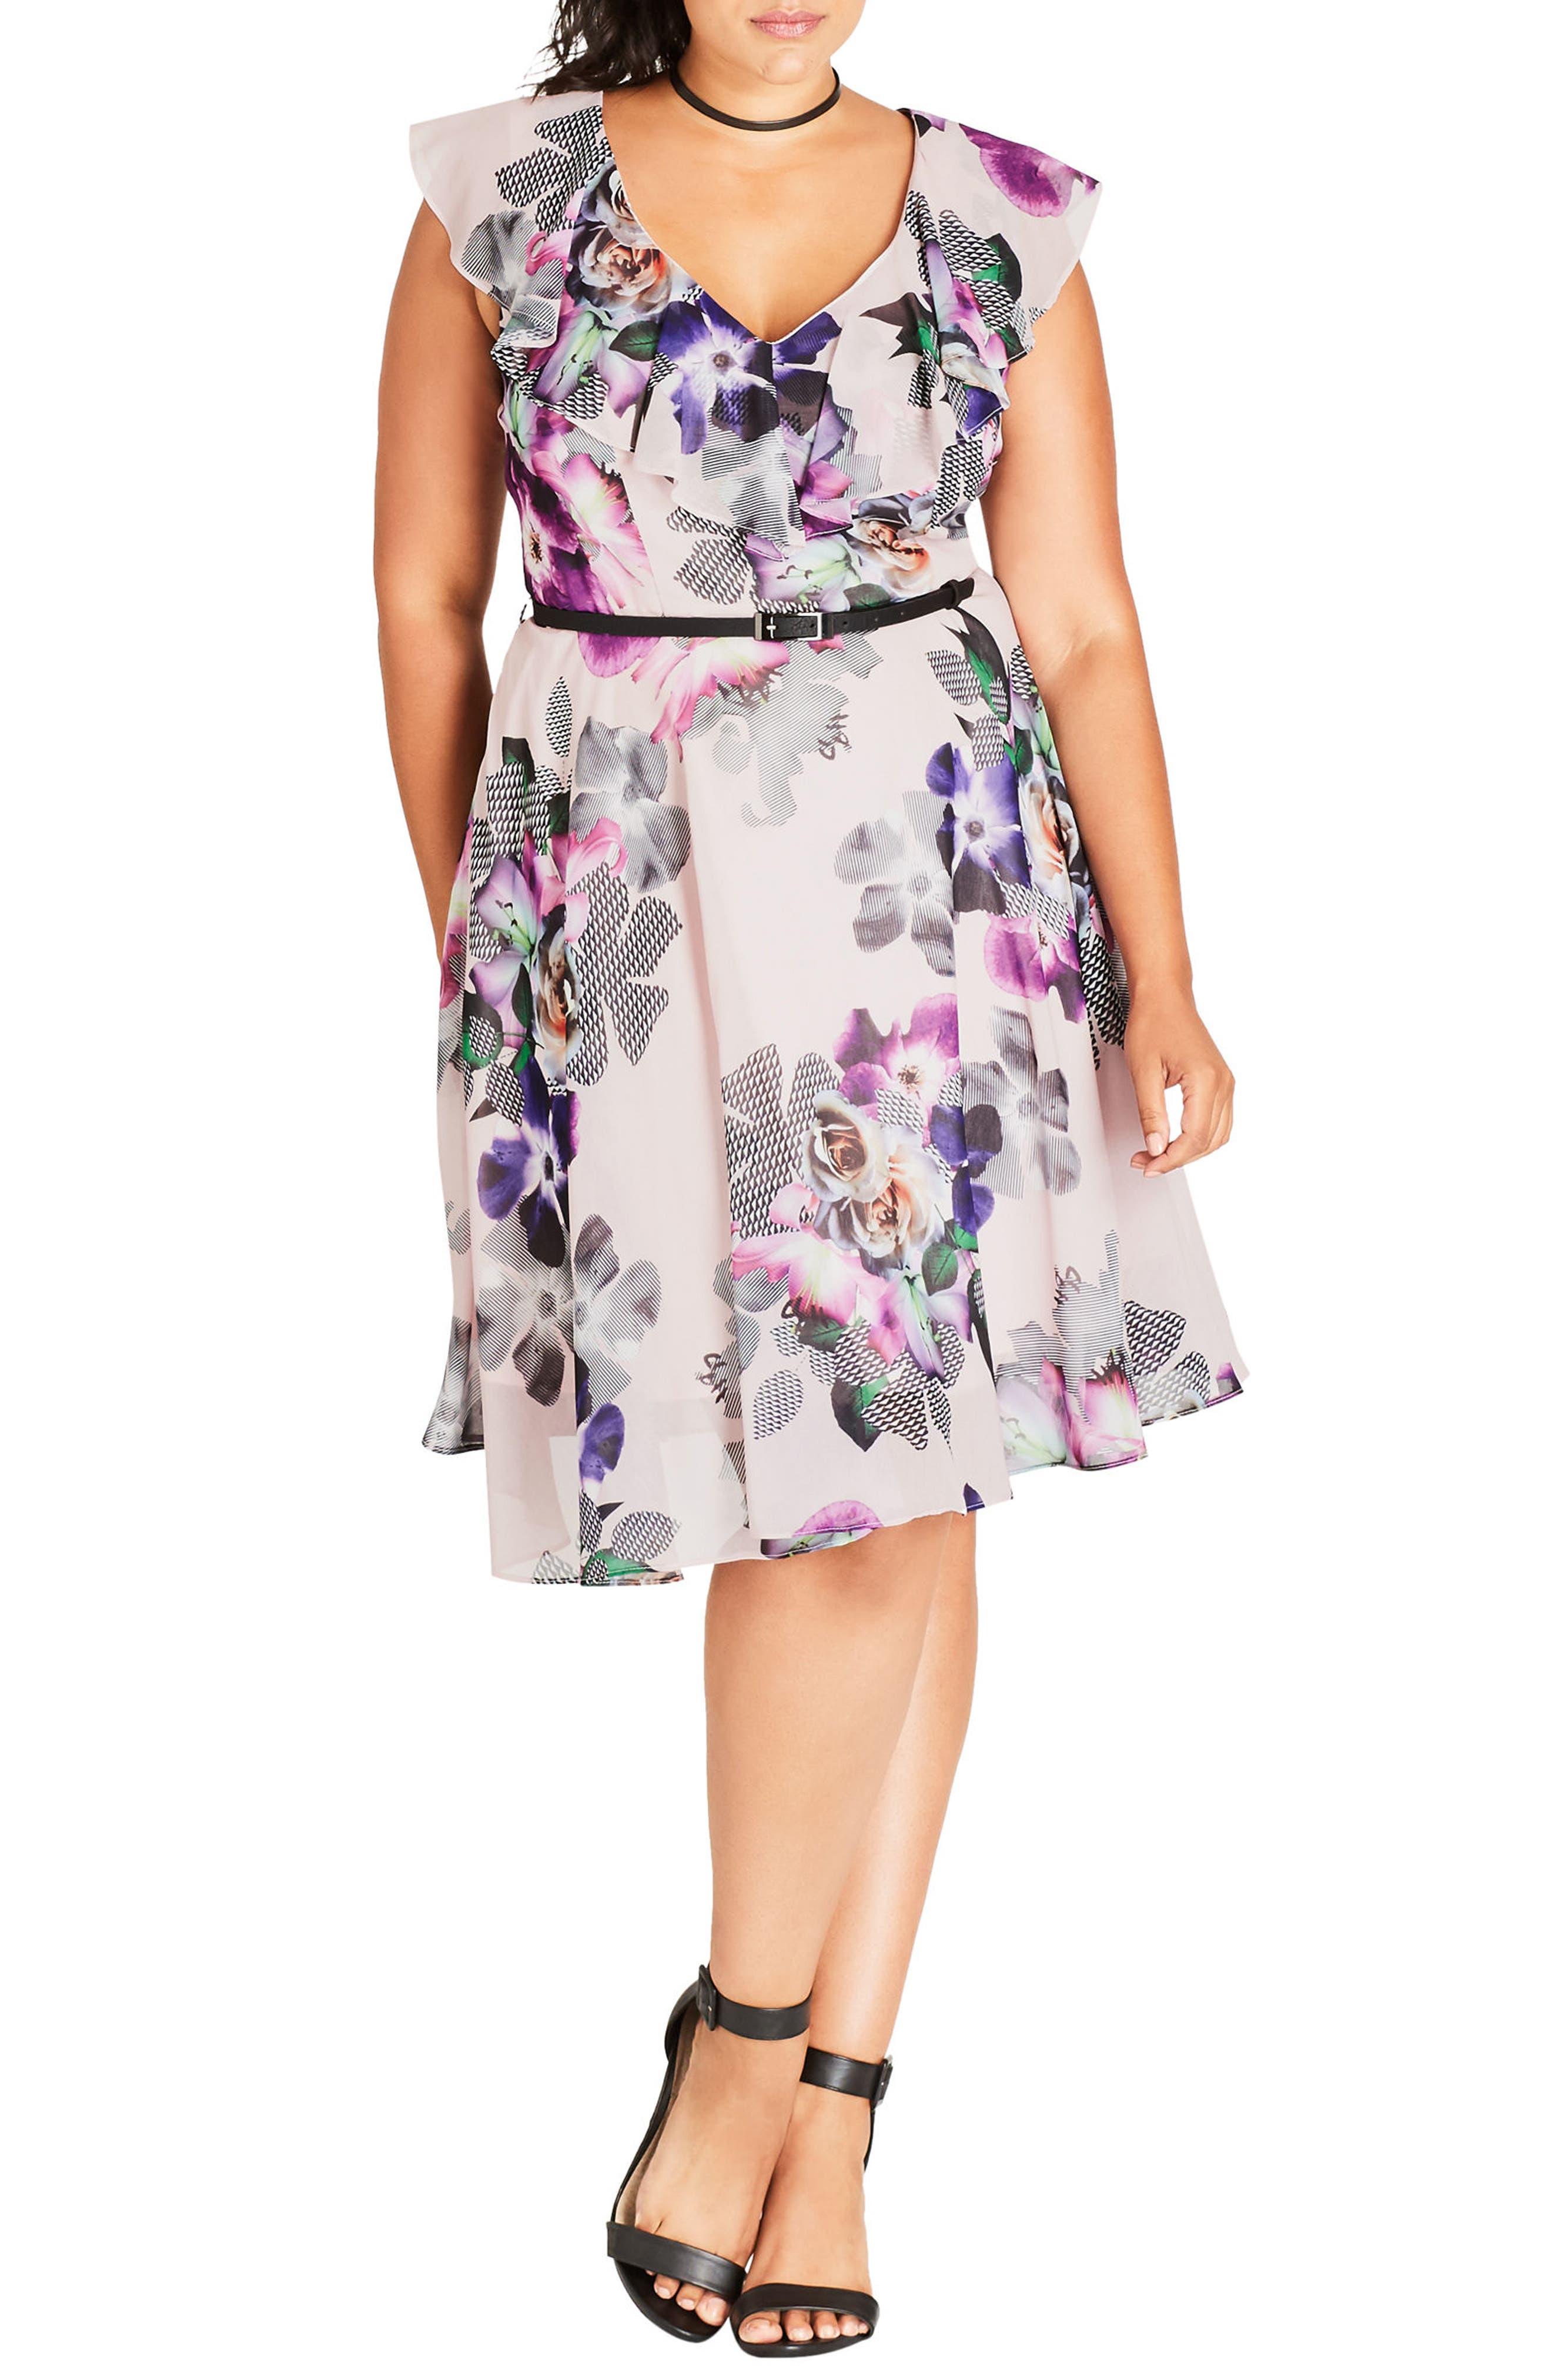 City Chic Romance Ruffle Floral Fit & Flare Dress (Plus Size)